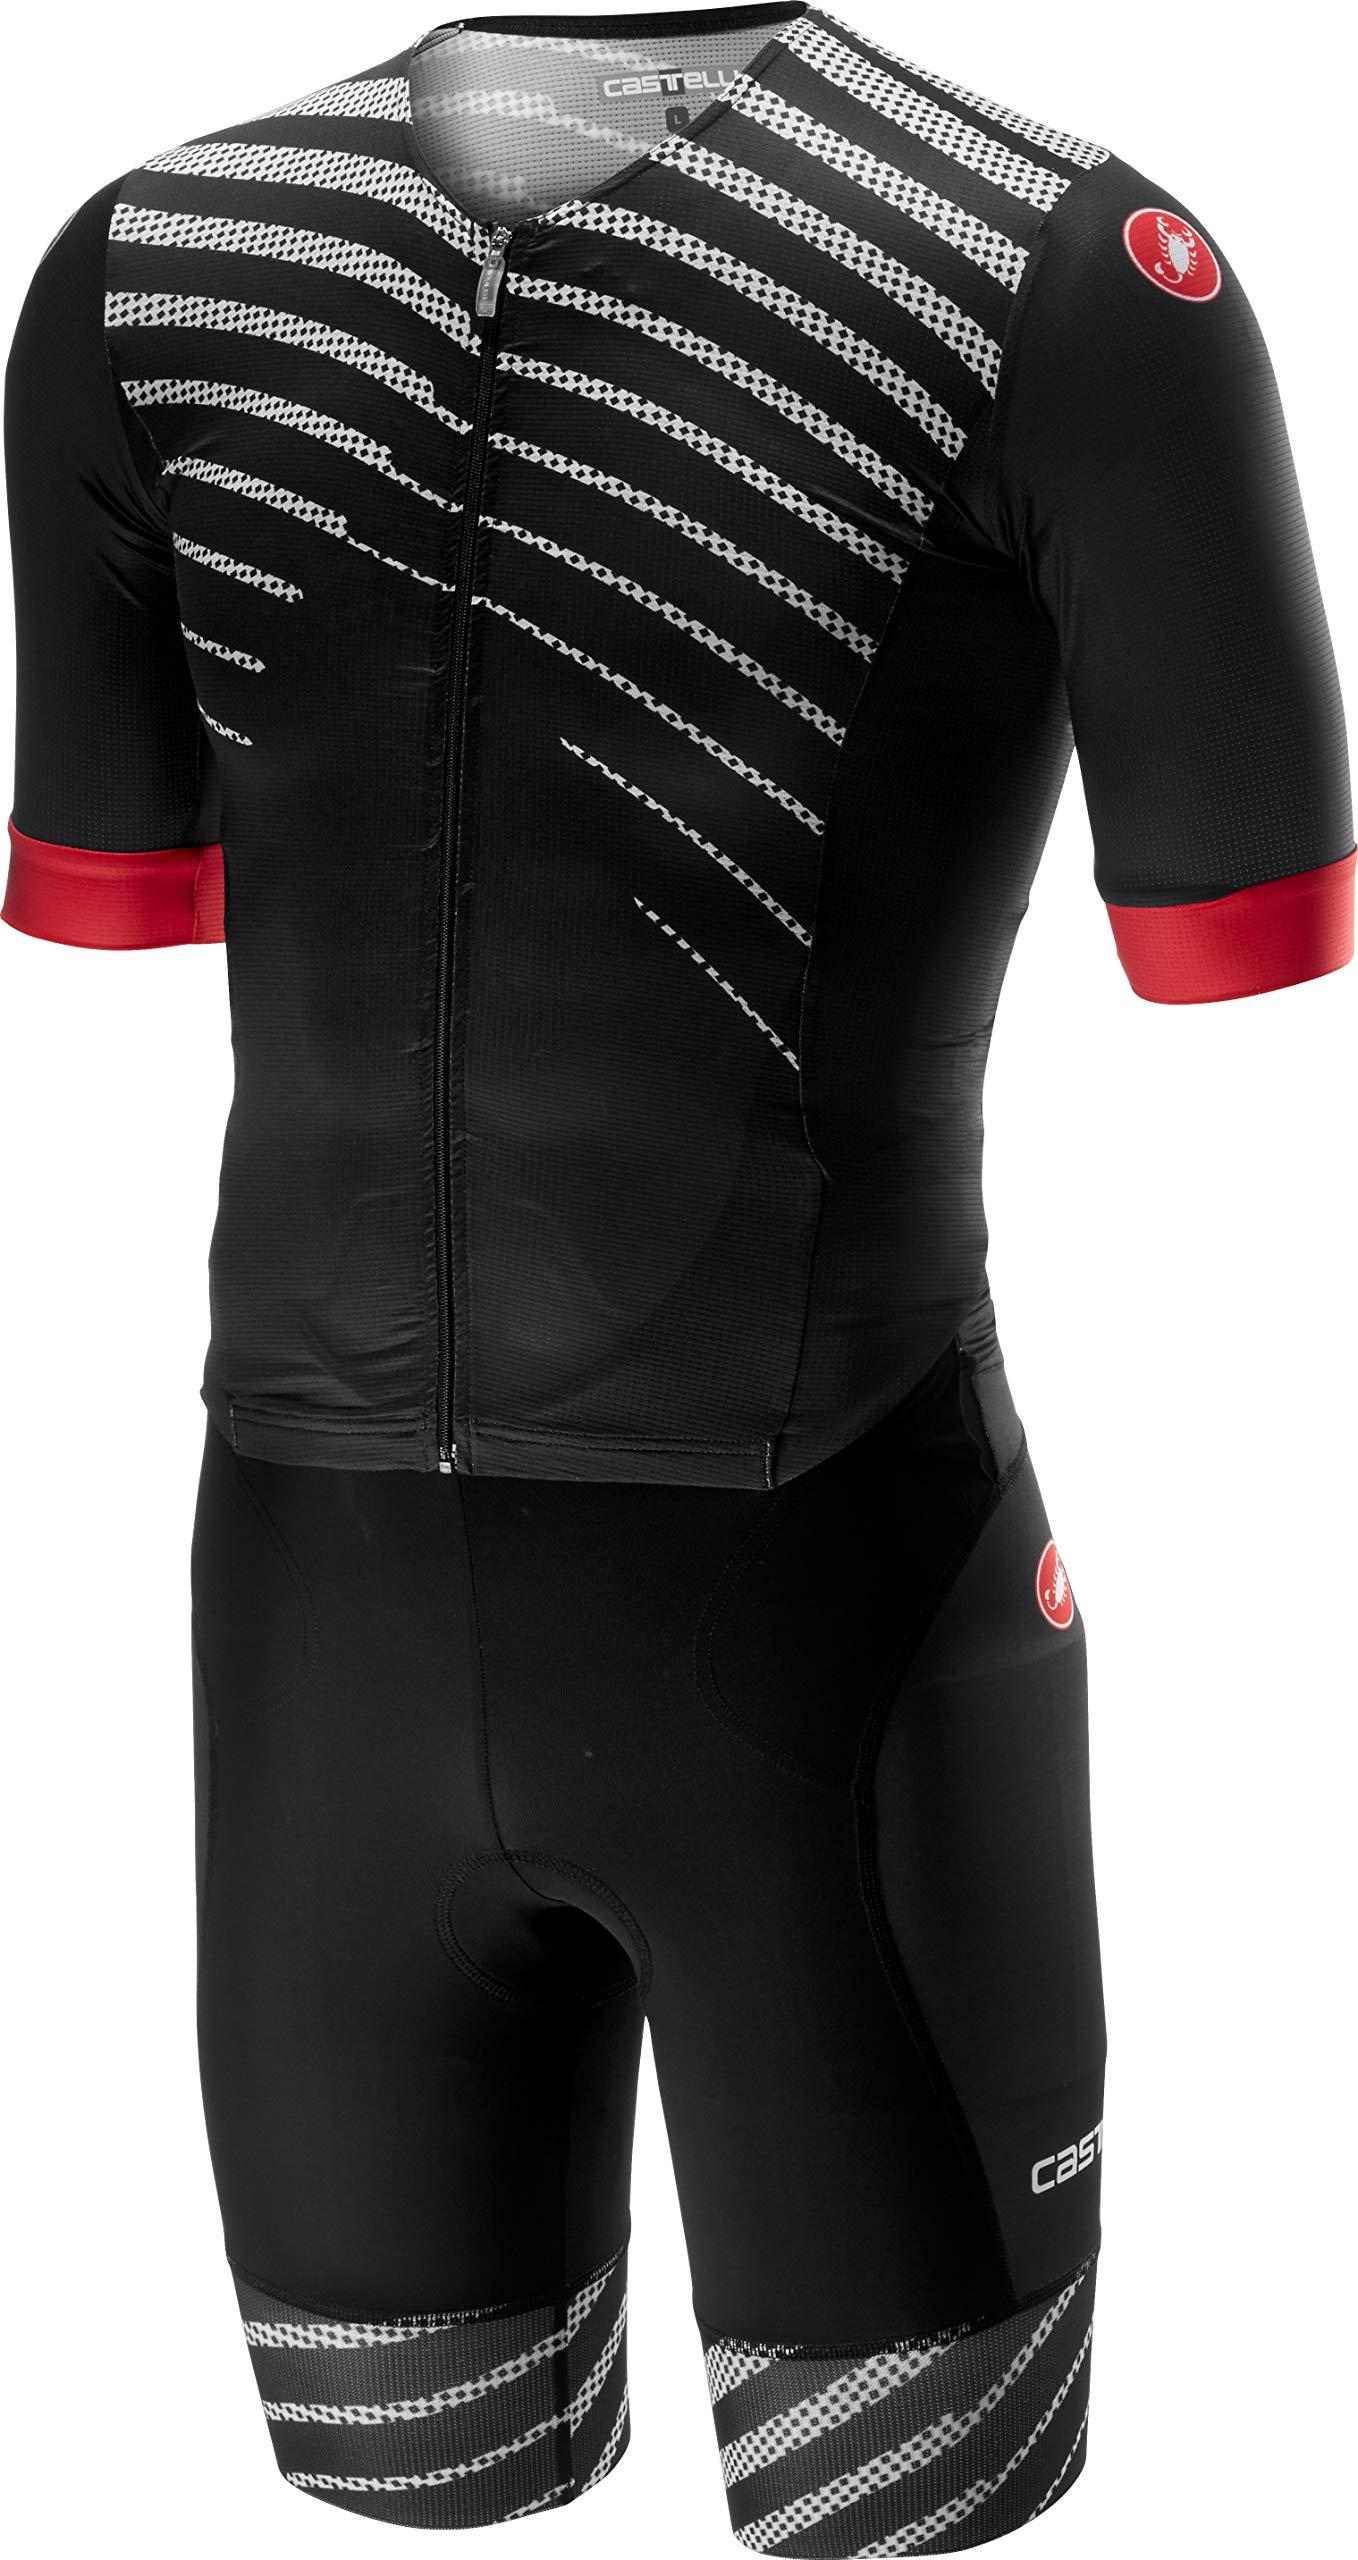 Castelli Free Sanremo Short-Sleeve Suit - Men's Black/Black, M